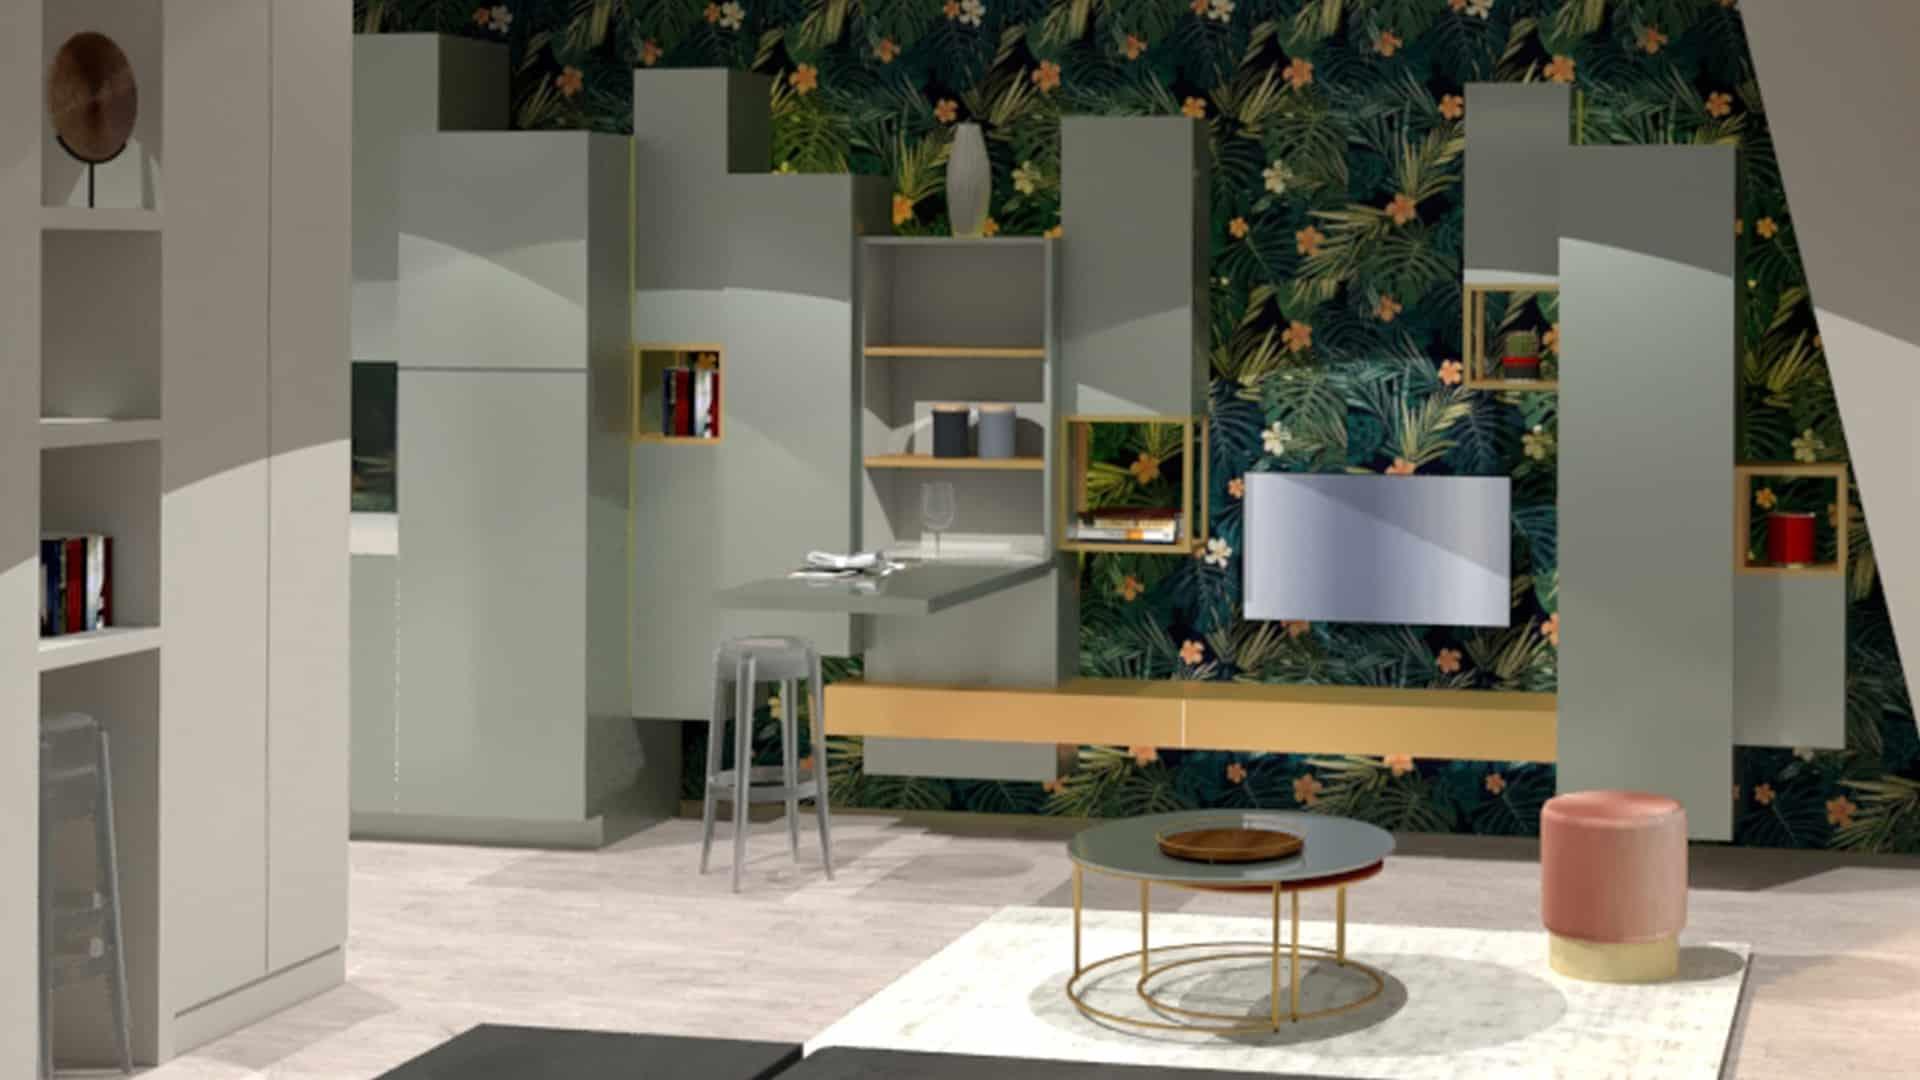 Appartement rue de Rennes. Vittoria Rizzoli architecte italien à paris